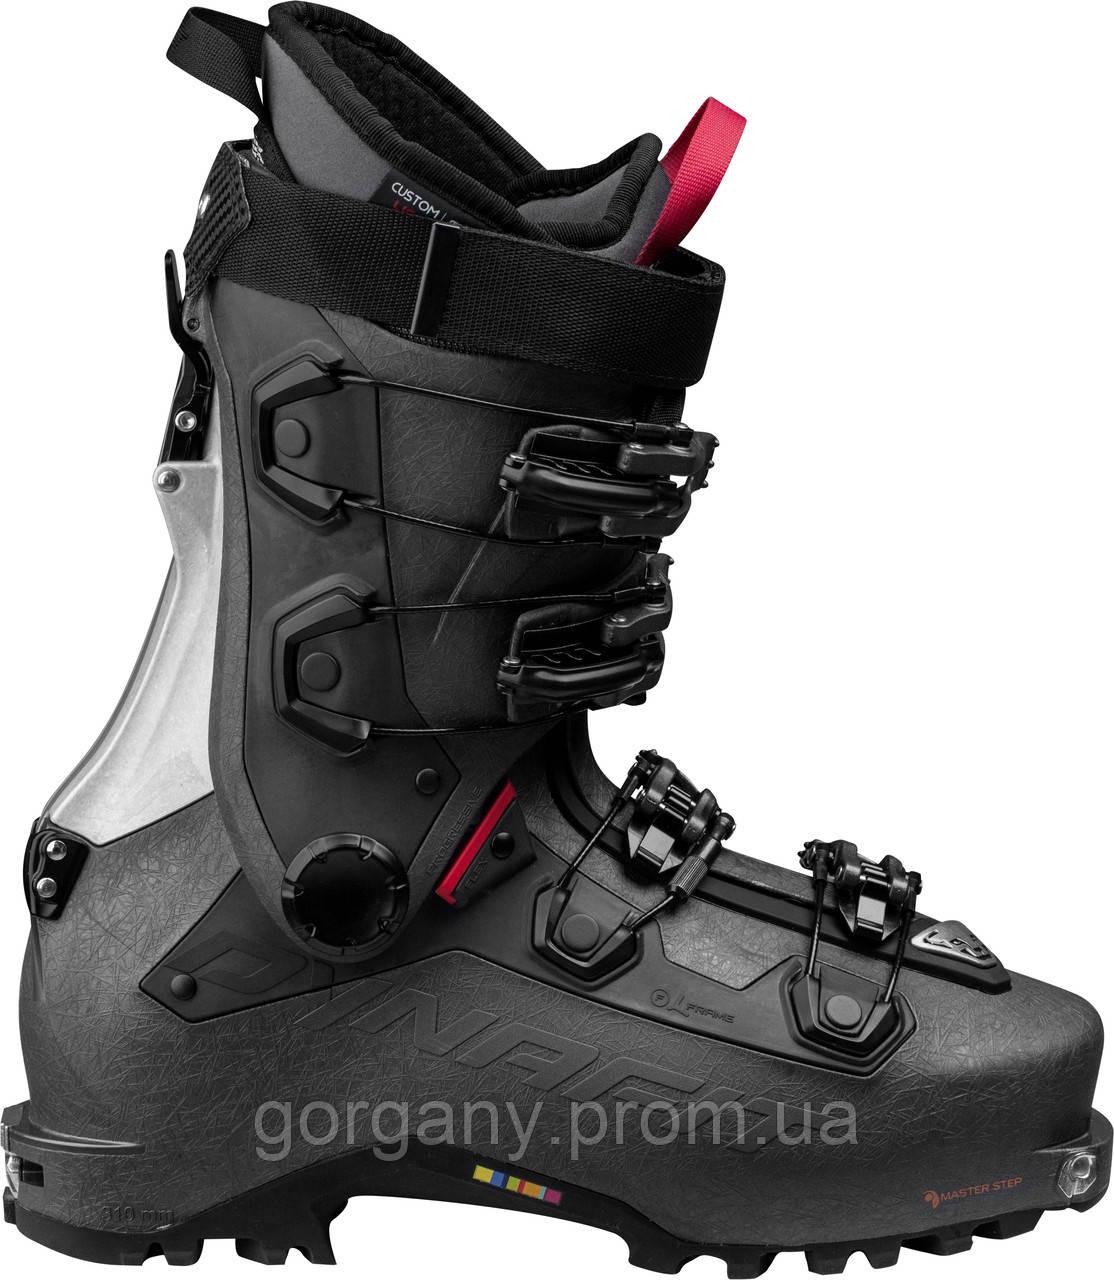 Лижні черевики Dynafit Beast - Gorgany в Киеве 63cf448e8e189